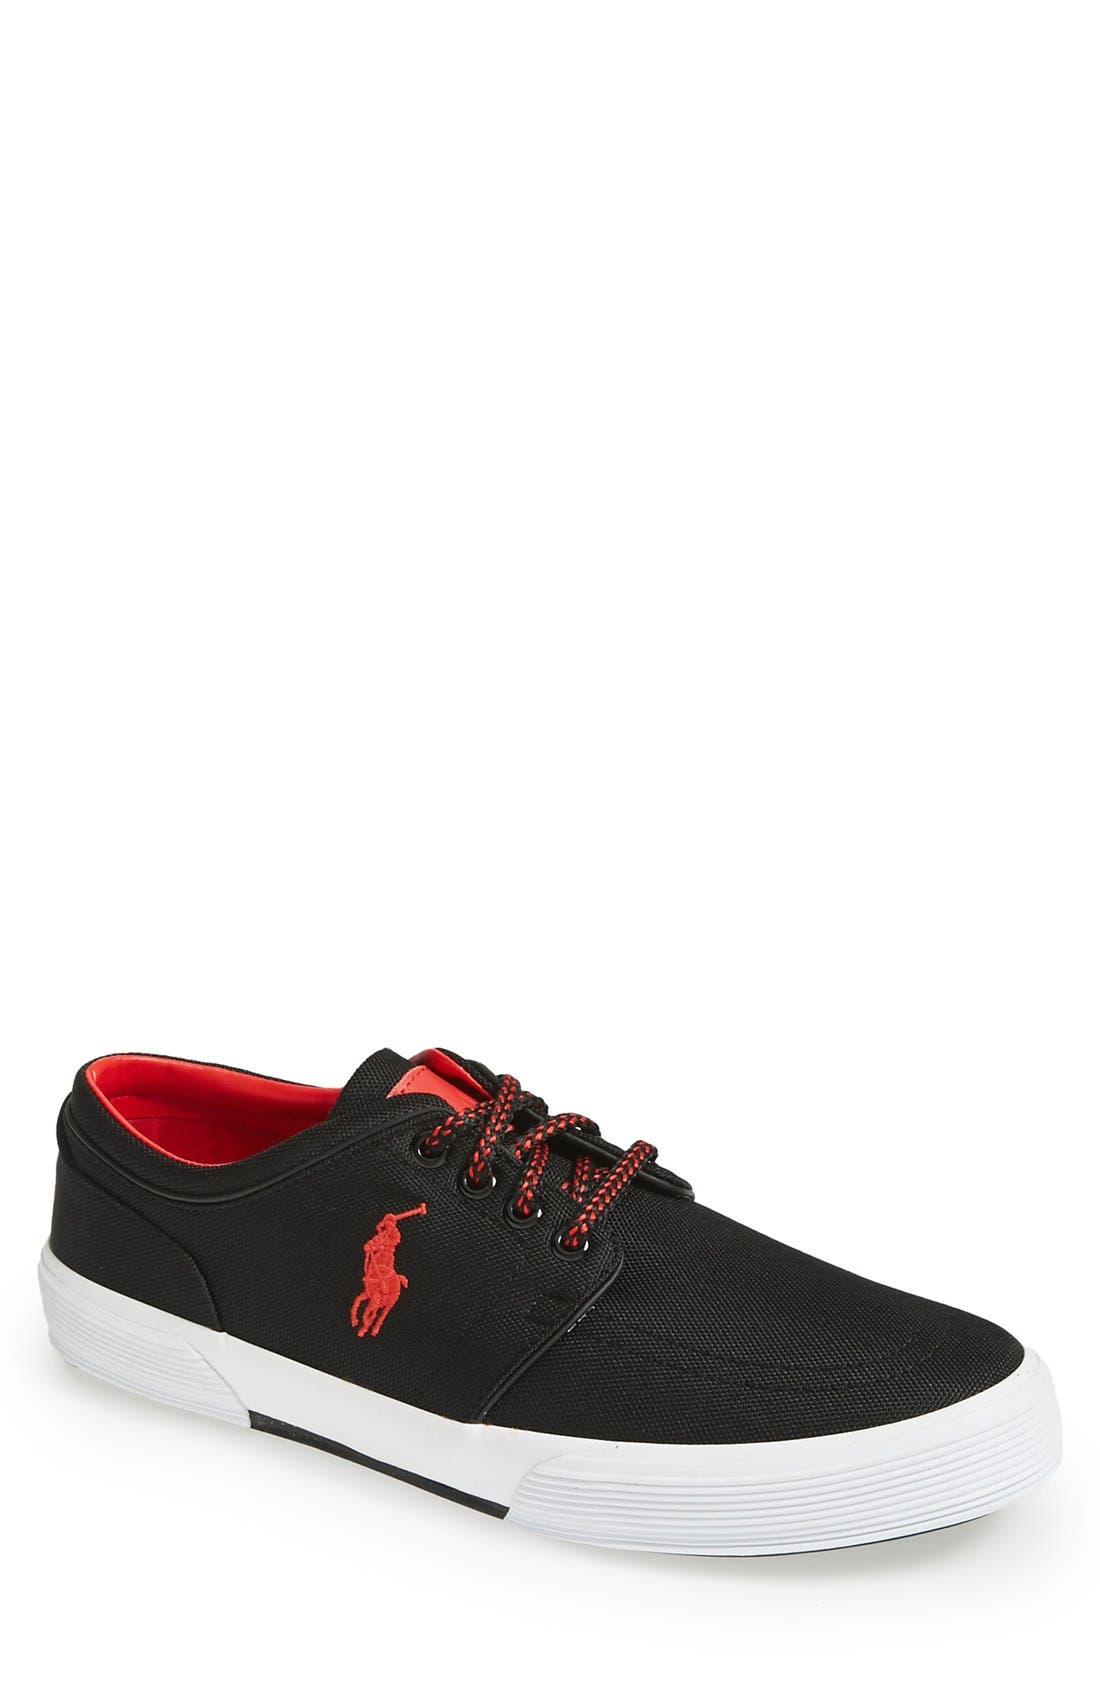 'Faxon Low' Sneaker,                         Main,                         color, 001